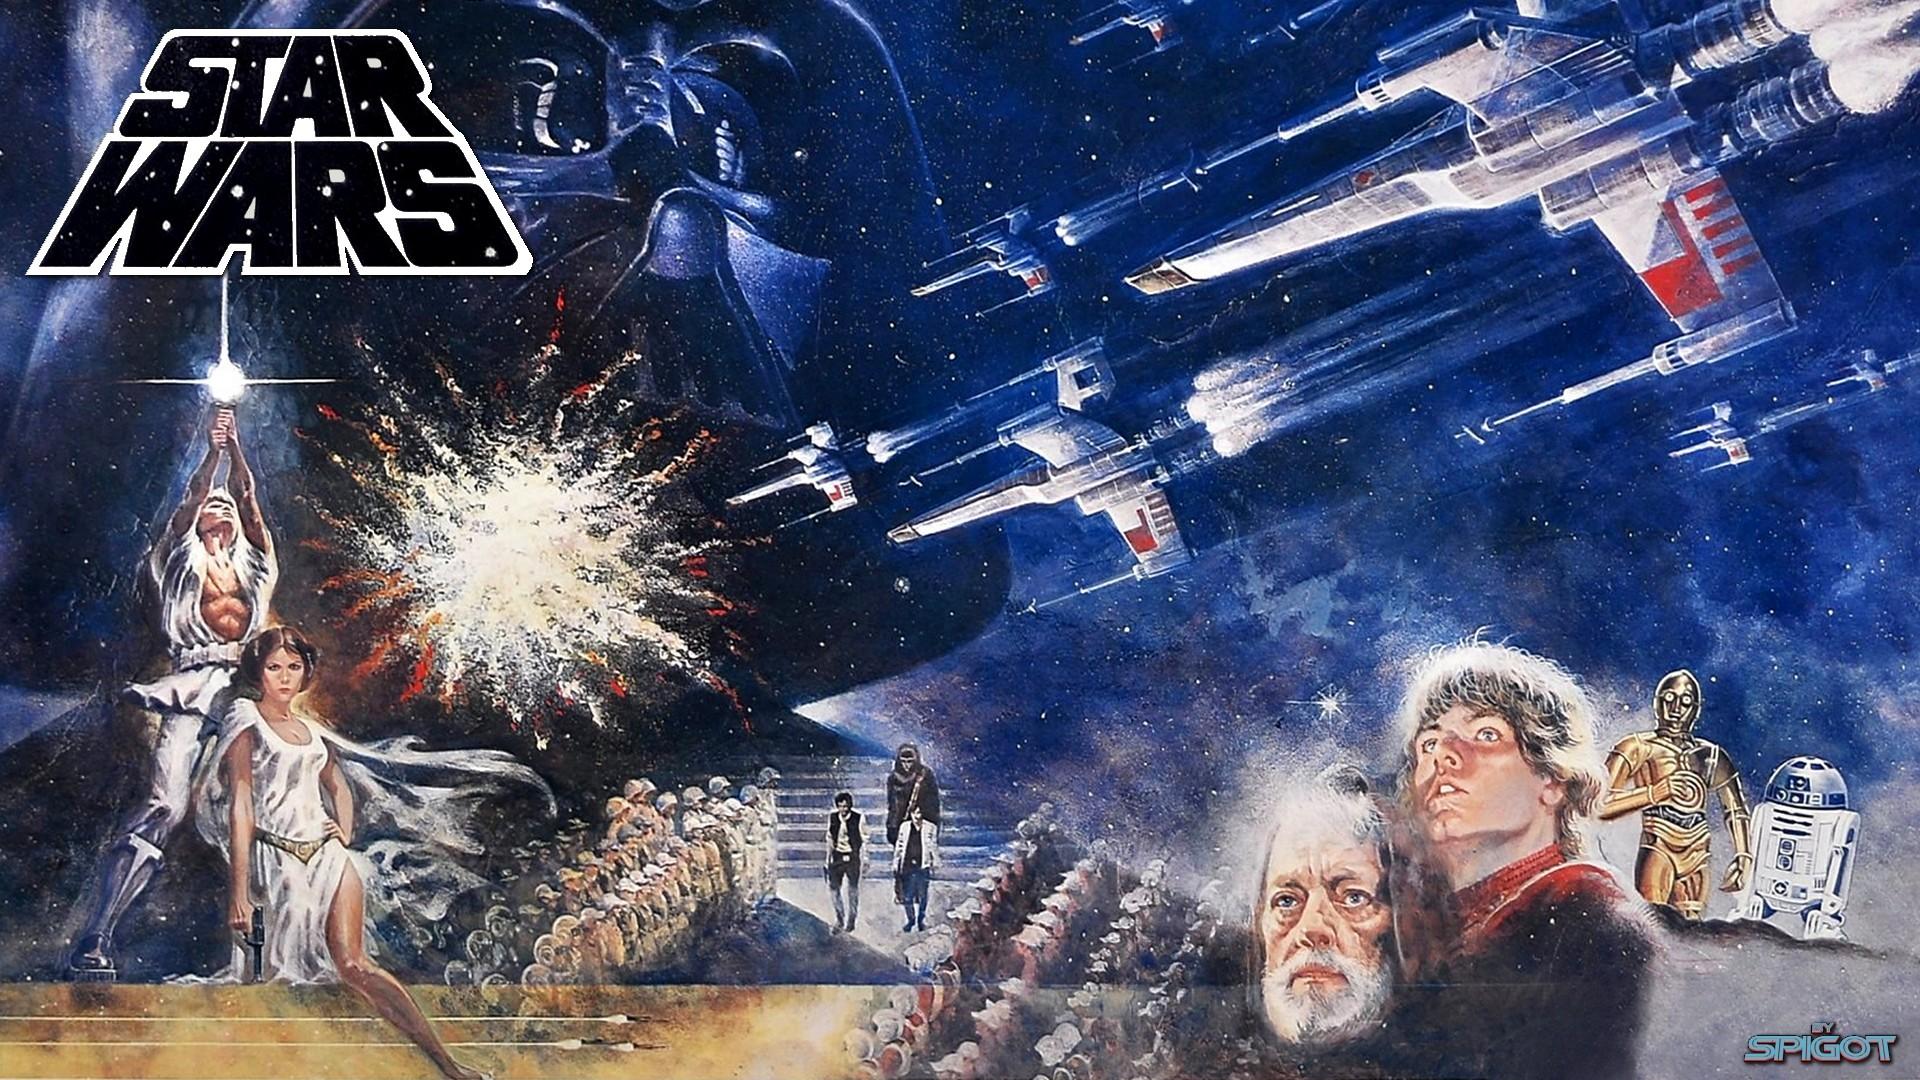 Star Wars George Spigots Blog 1920x1080